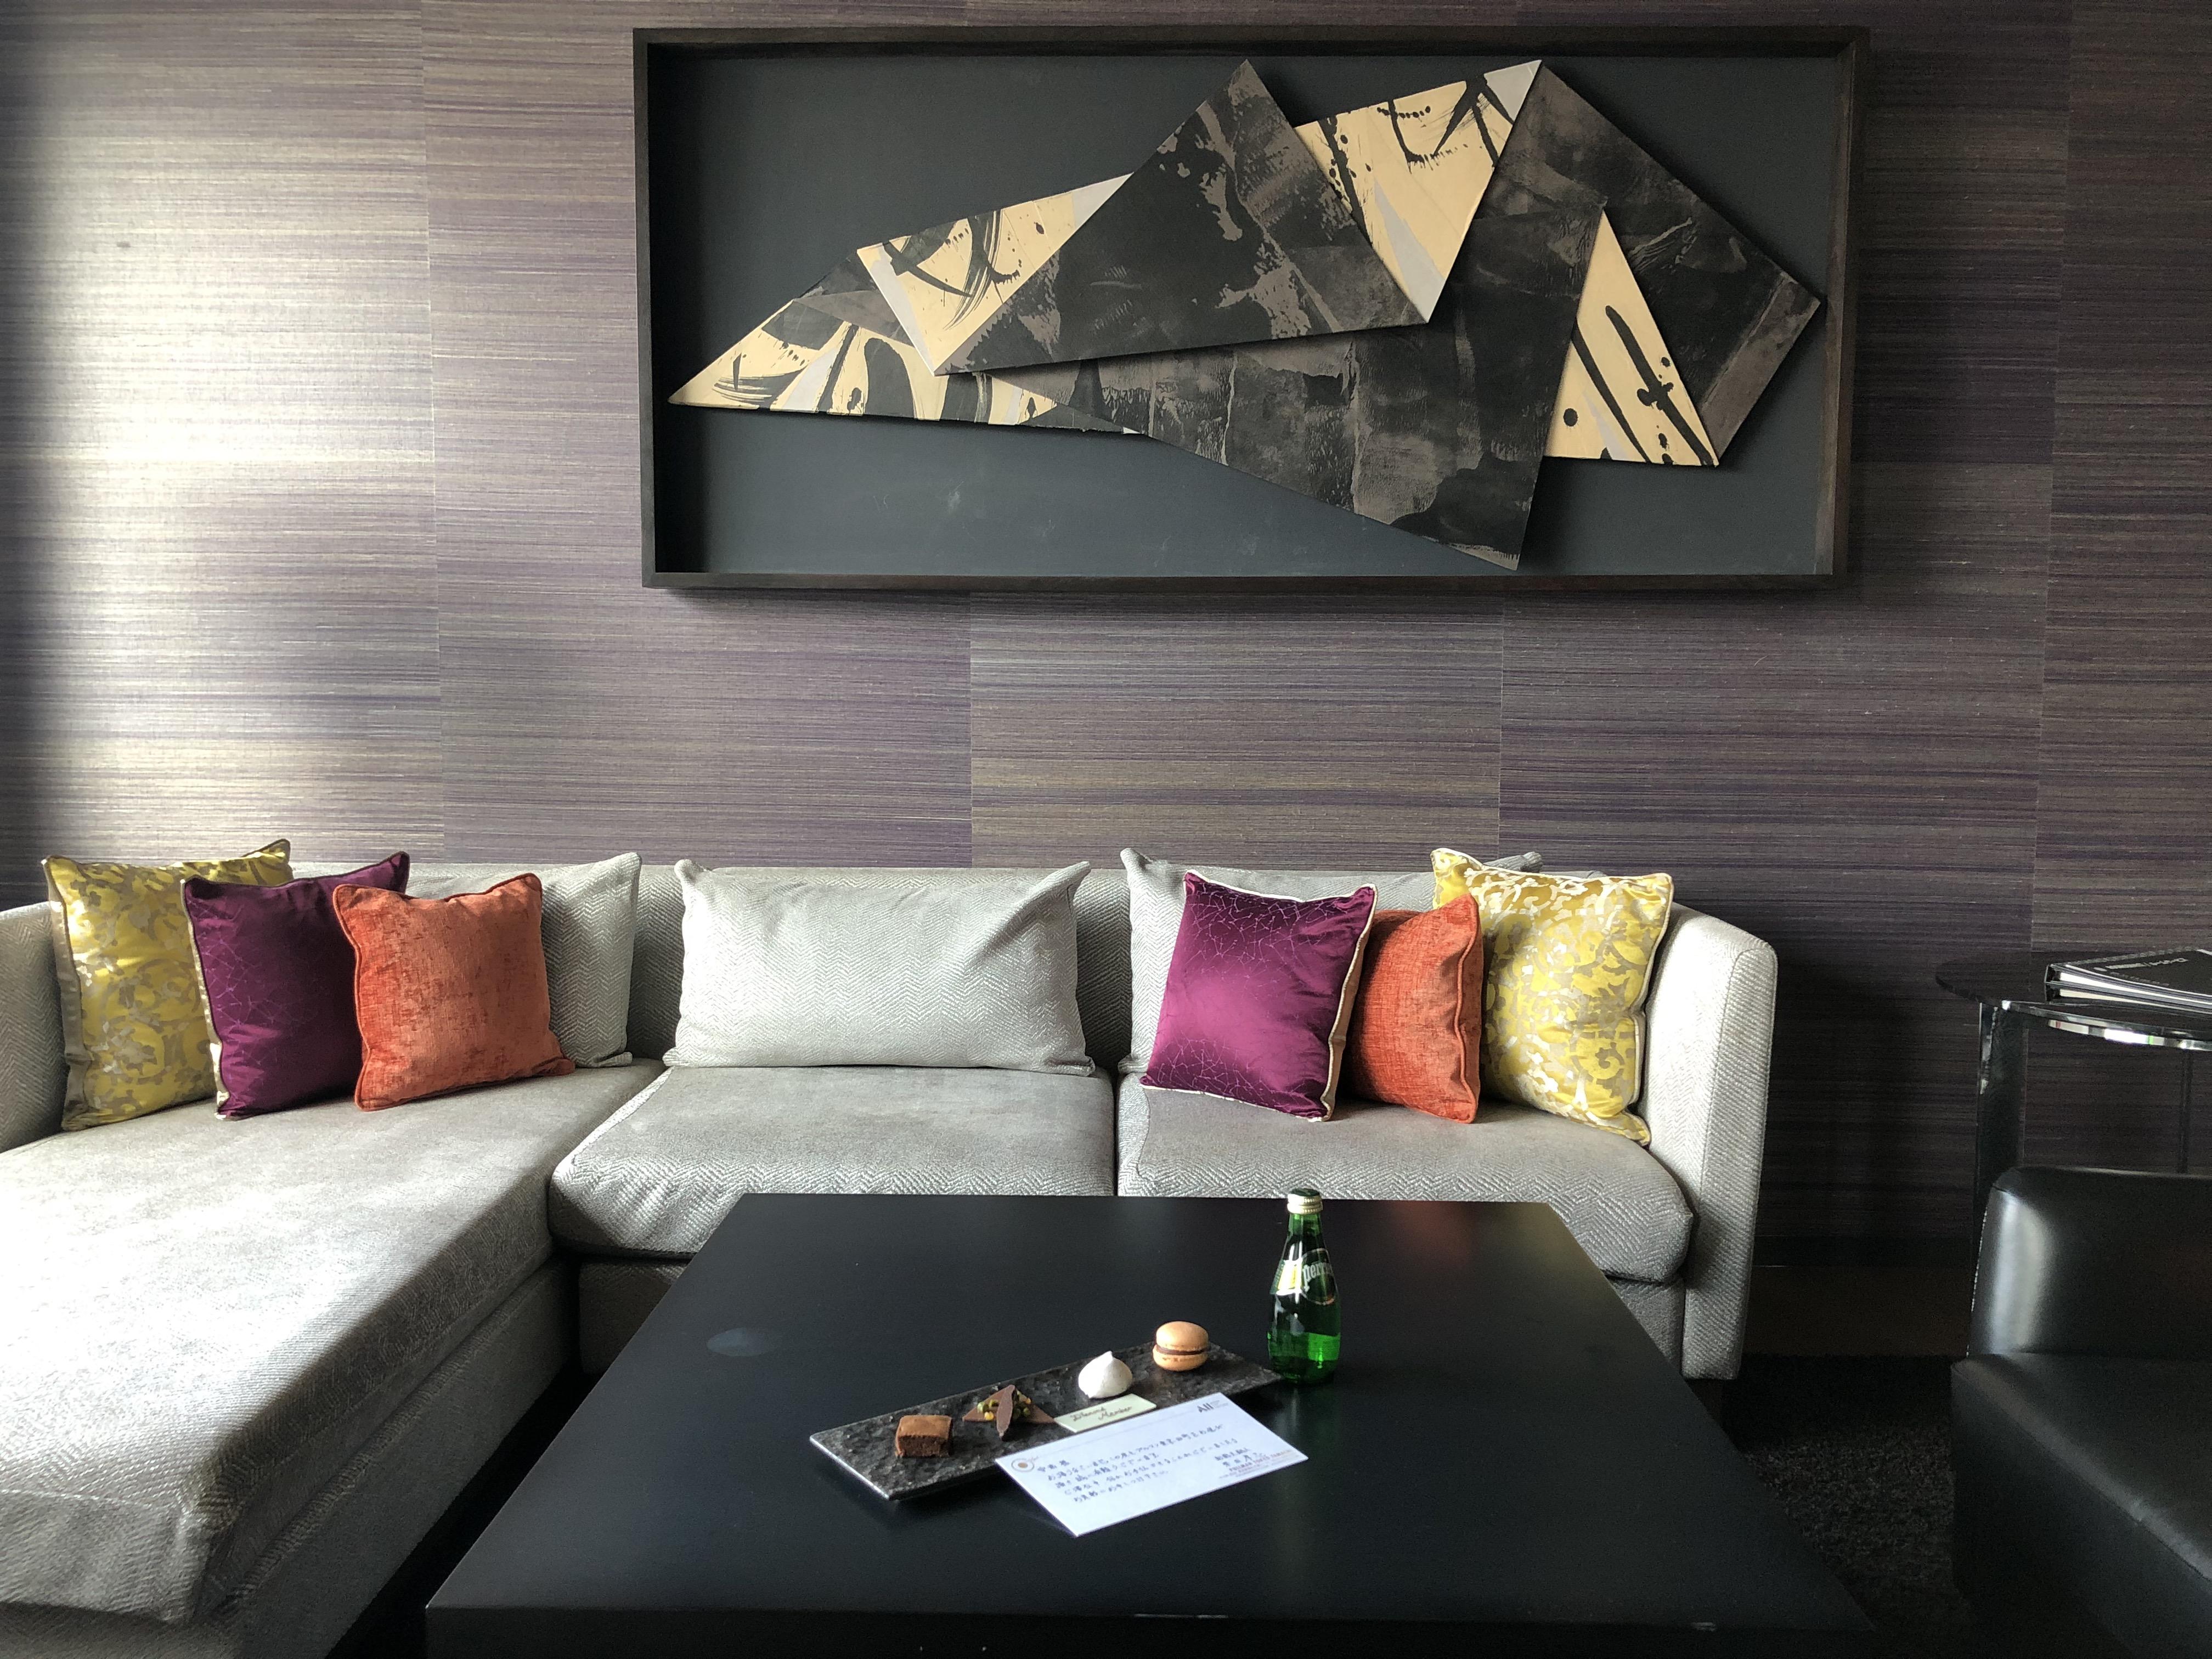 Hotel Review : プルマン東京田町 デラックススイートルーム(Pullman Tokyo Tamachi Superior Suite Room)